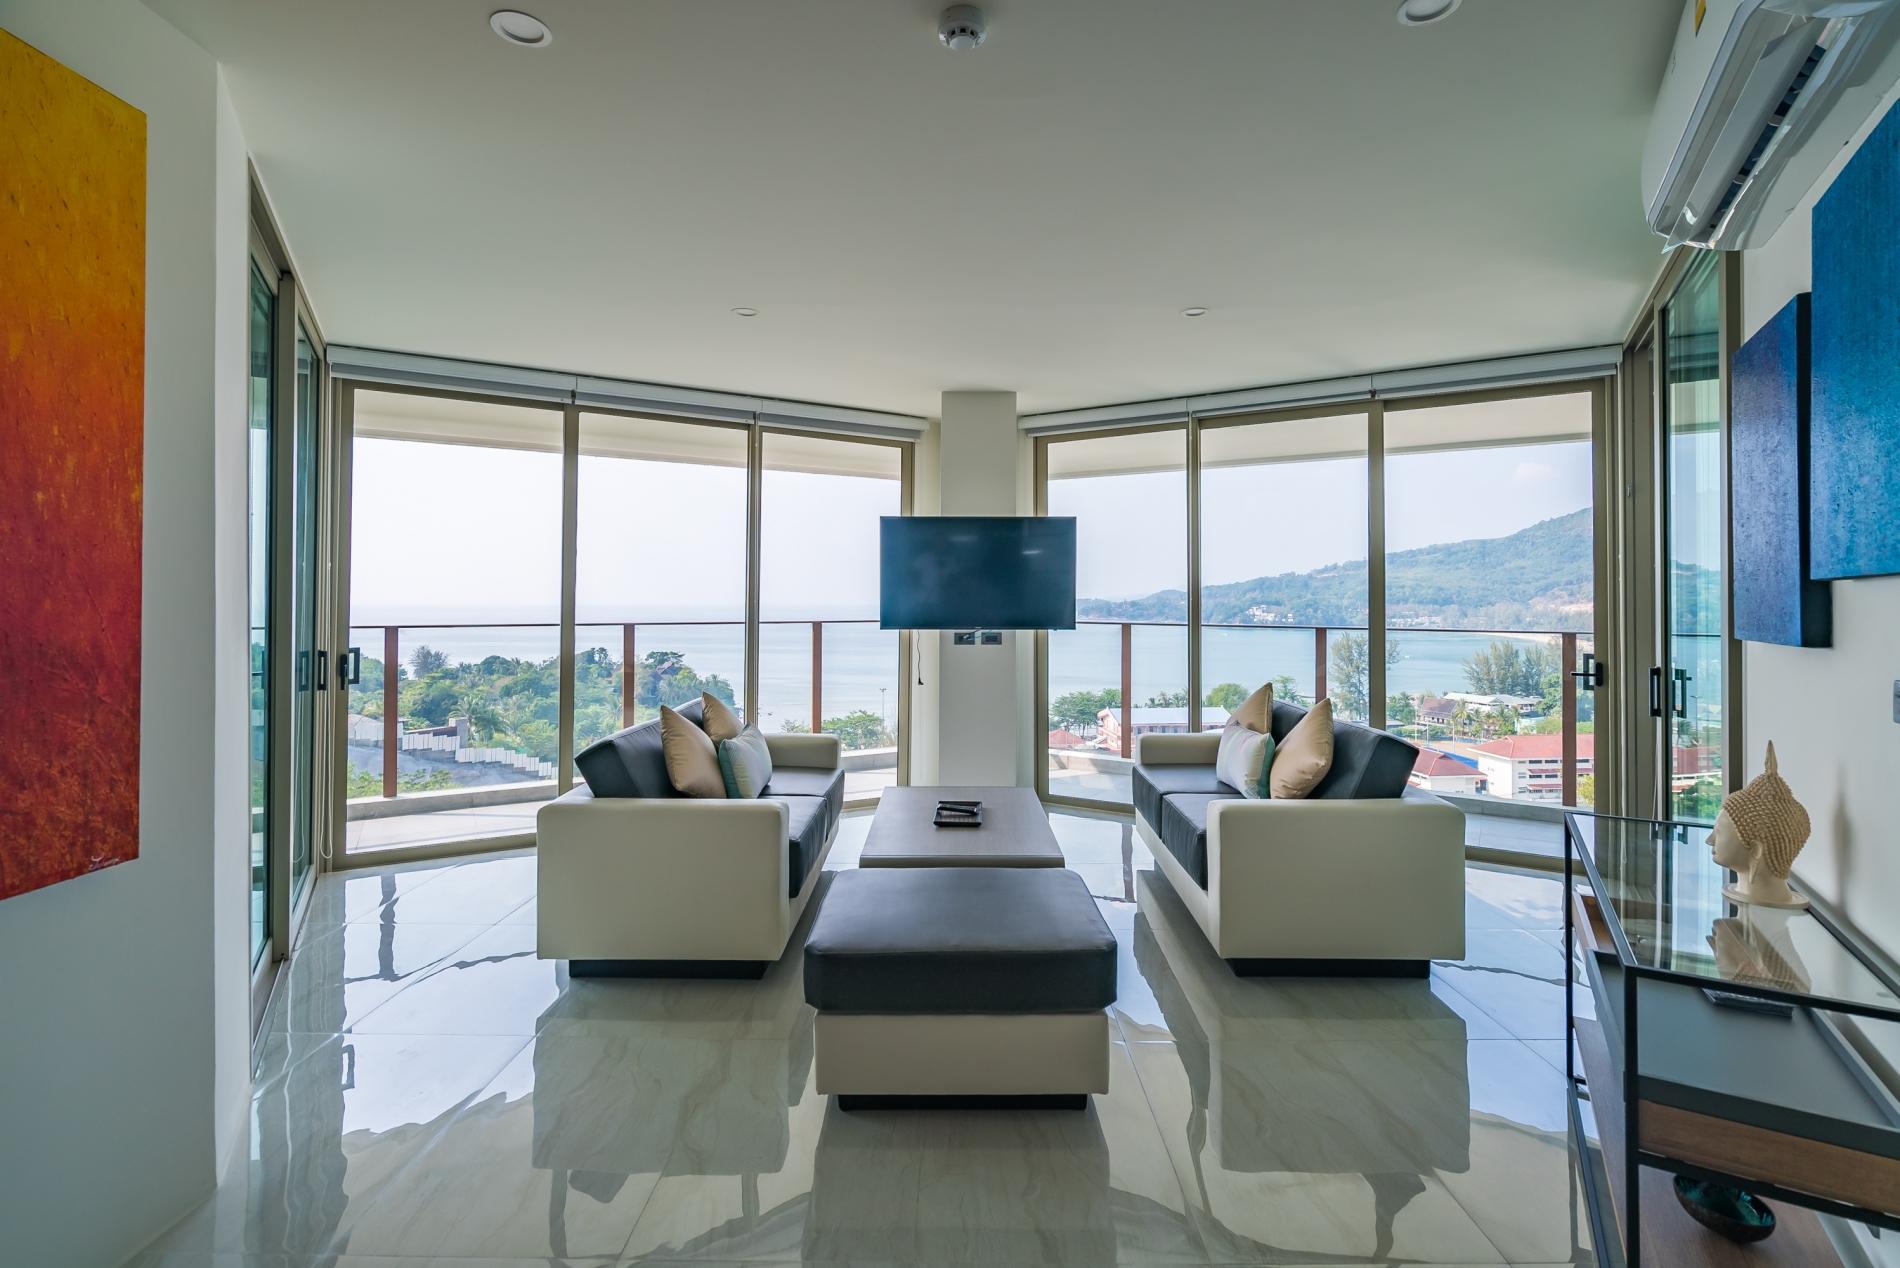 Oceana Full seaview private pool luxury apartment photo 16833964